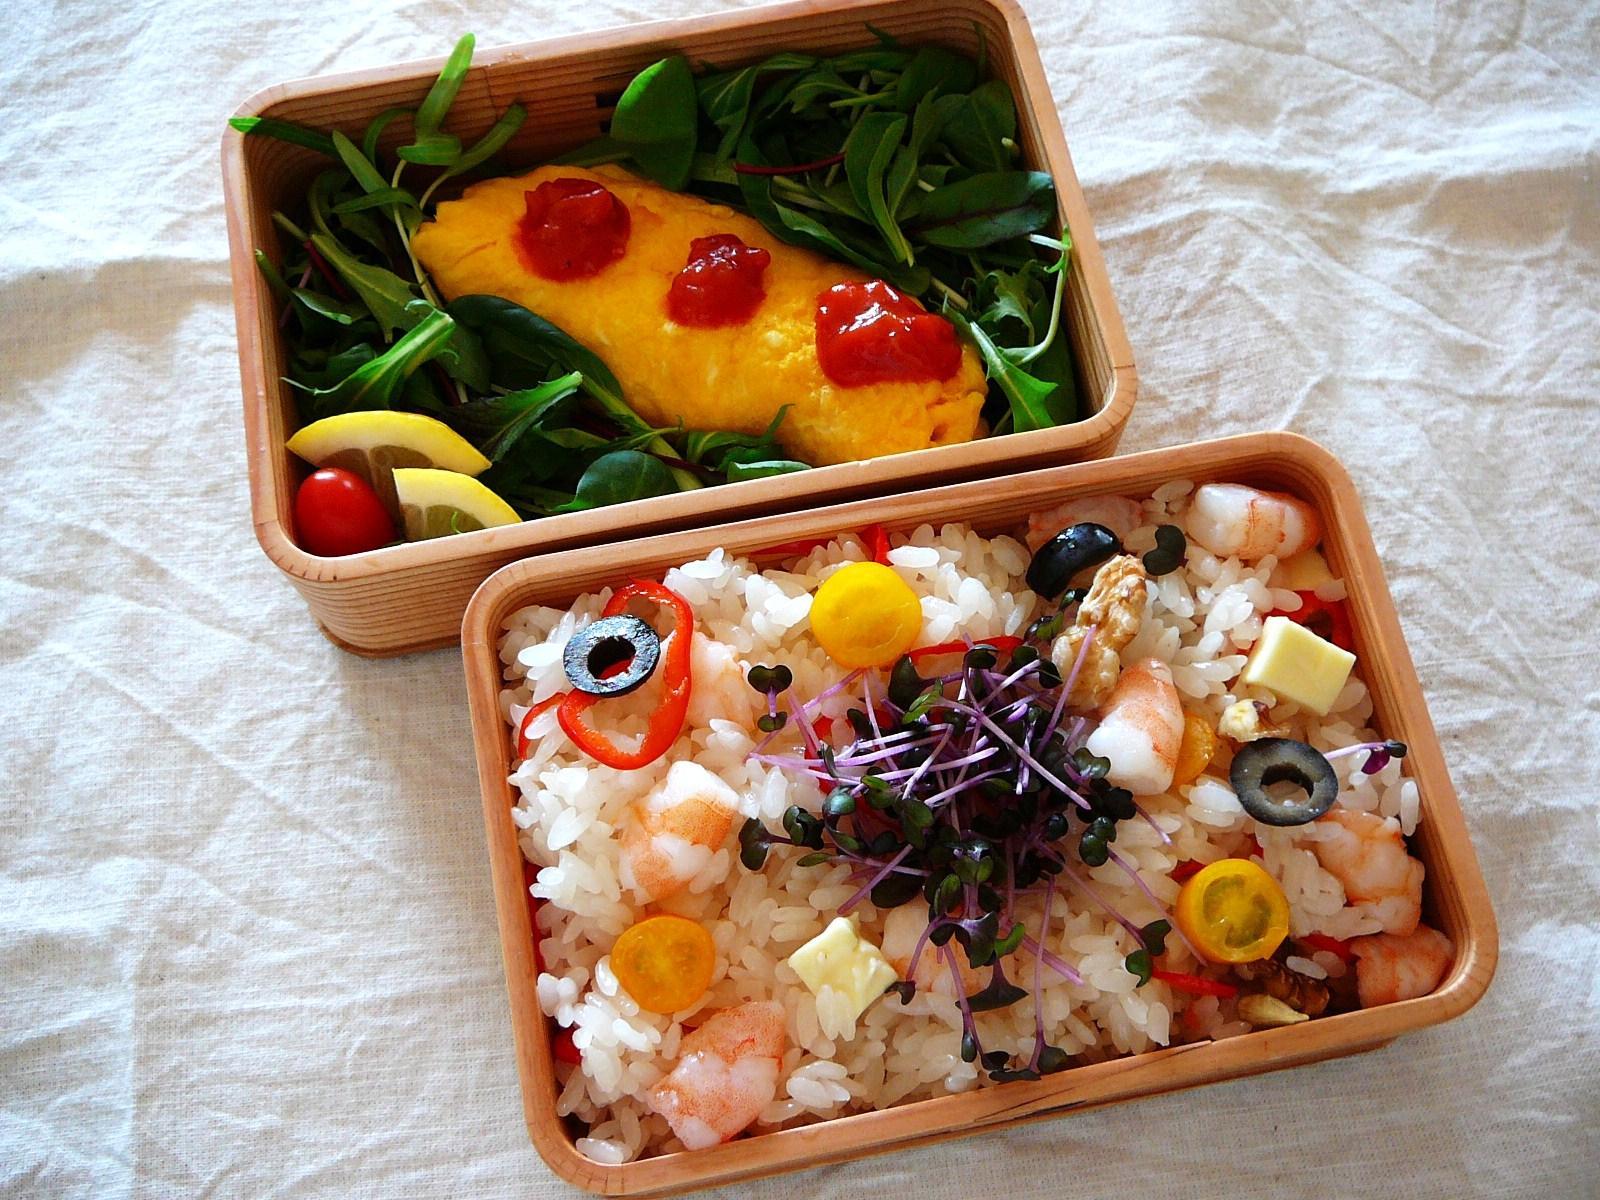 today s bento lunch box 12 10 chirashizushi omelet bento shizuoka sushi sashimi the. Black Bedroom Furniture Sets. Home Design Ideas